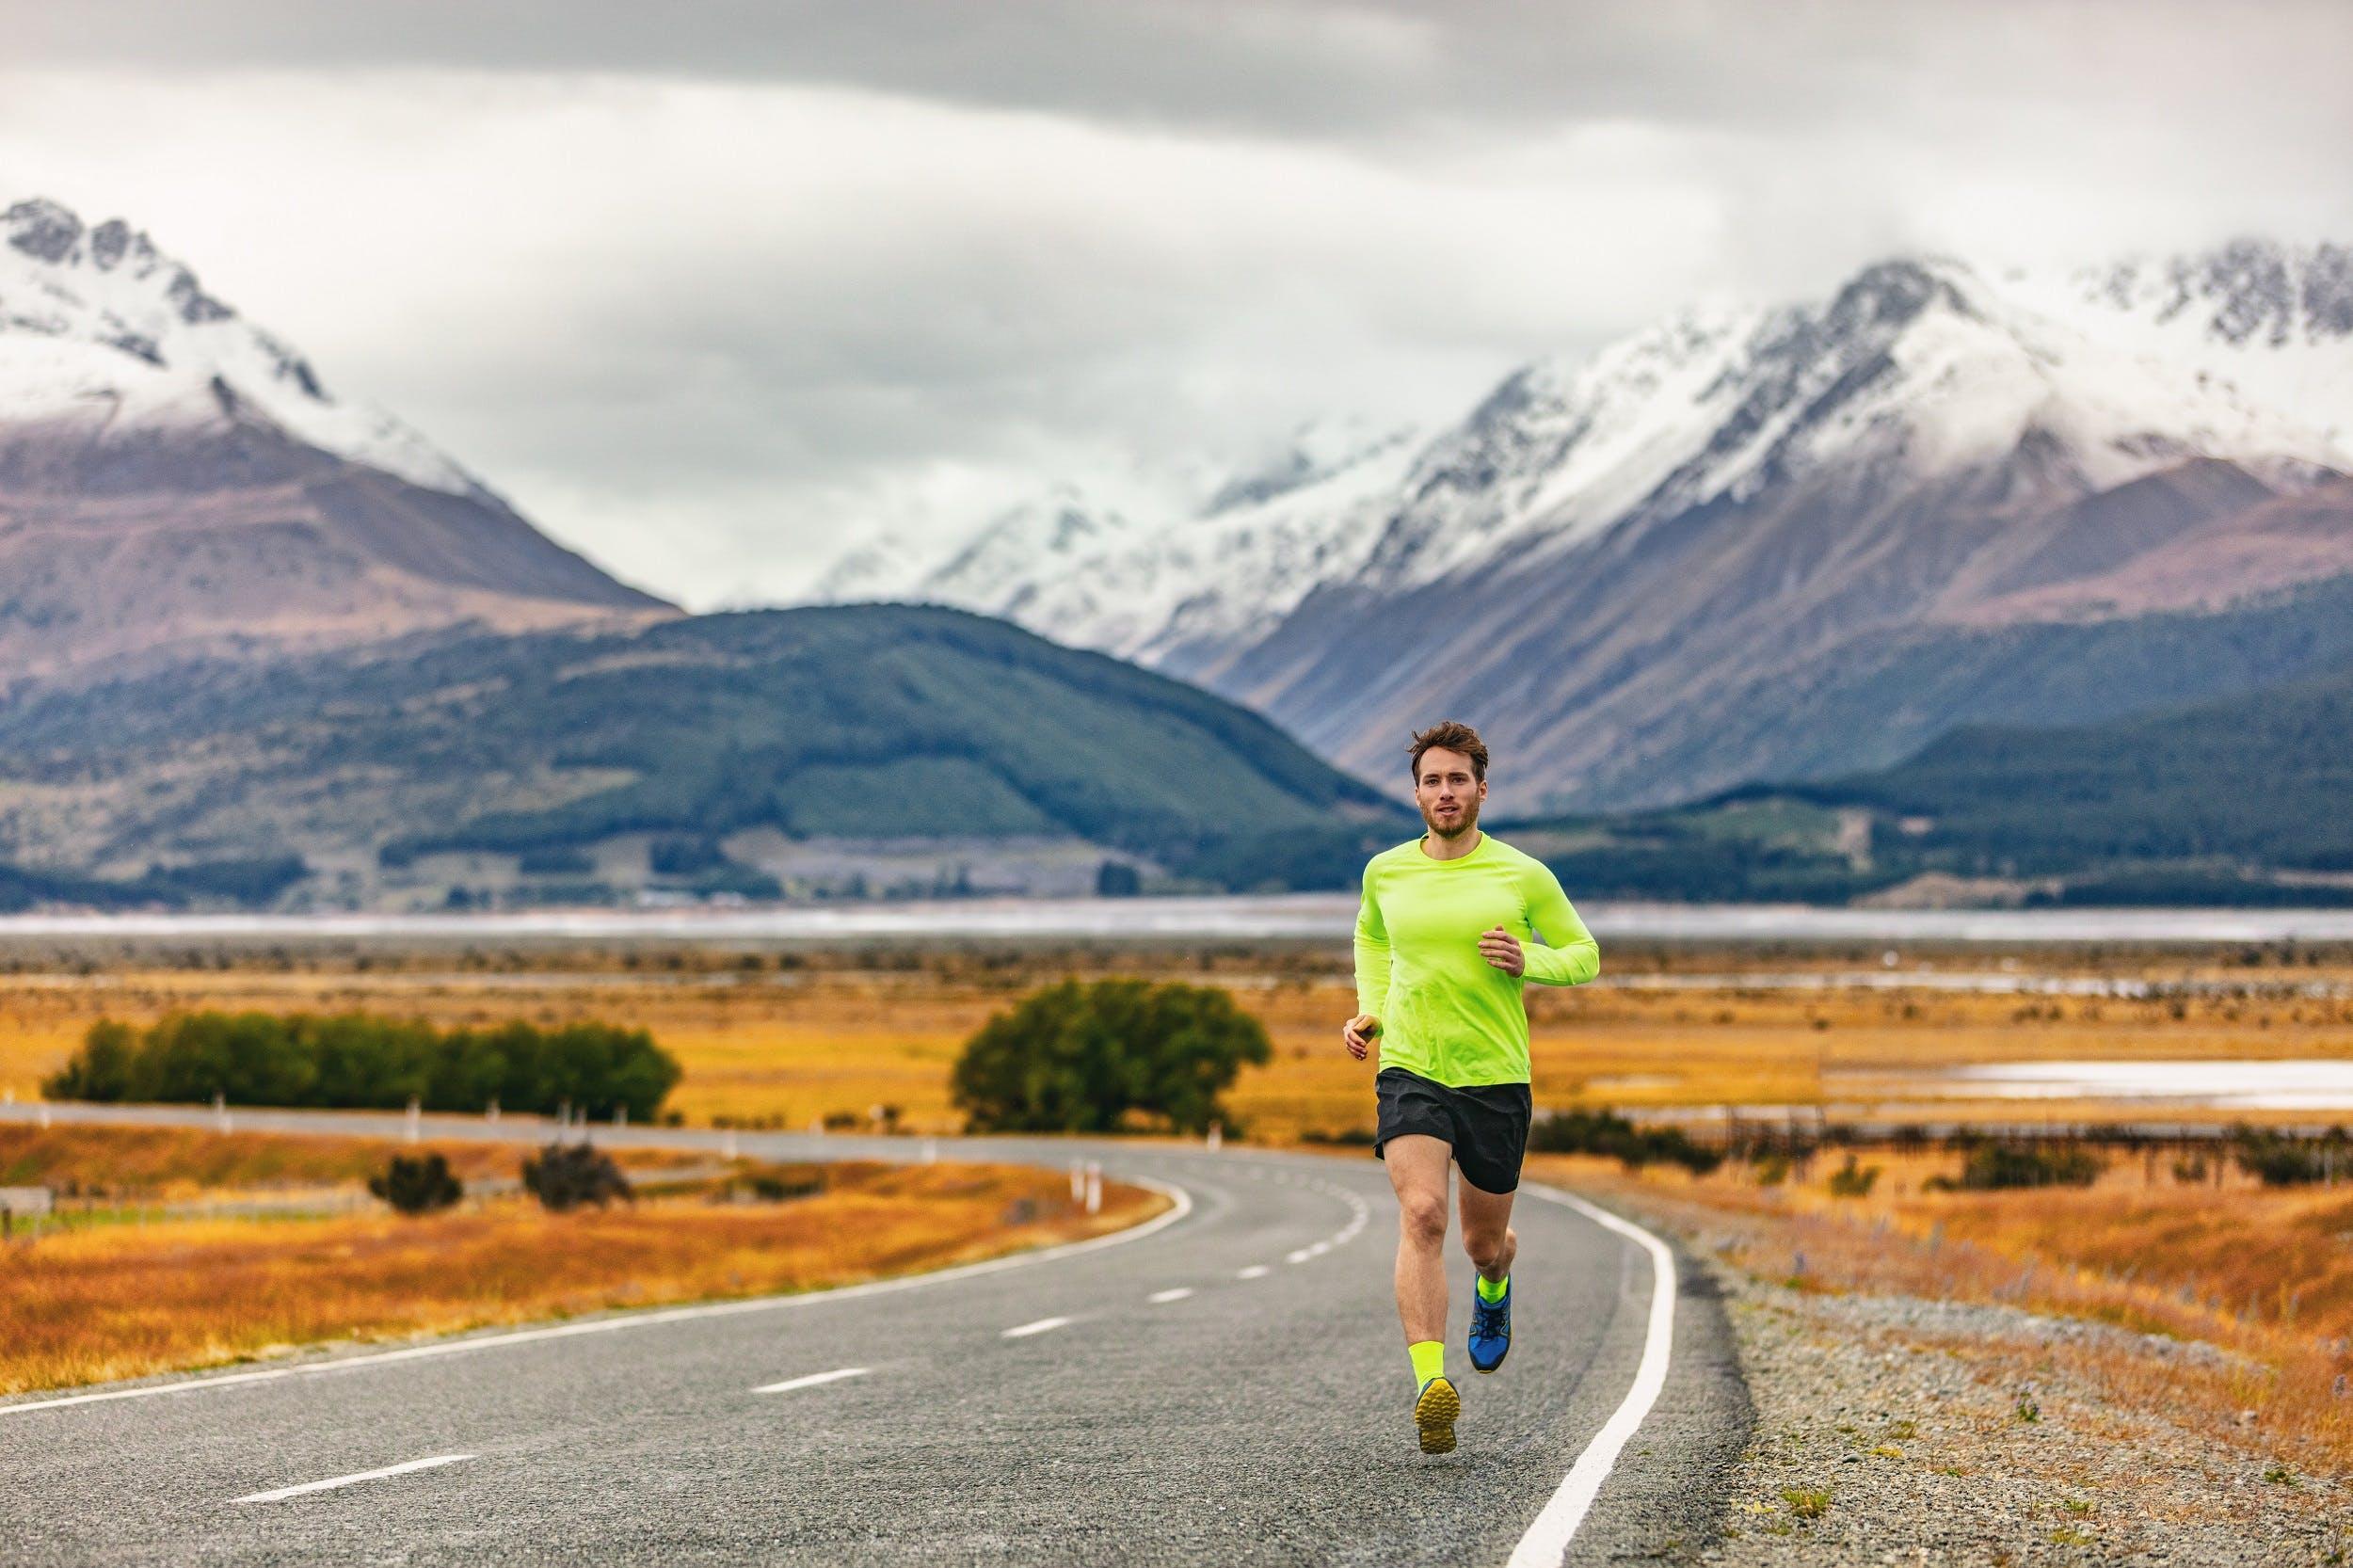 Long run: Συμβουλές για να το βάλεις σωστά στην προπόνησή σου